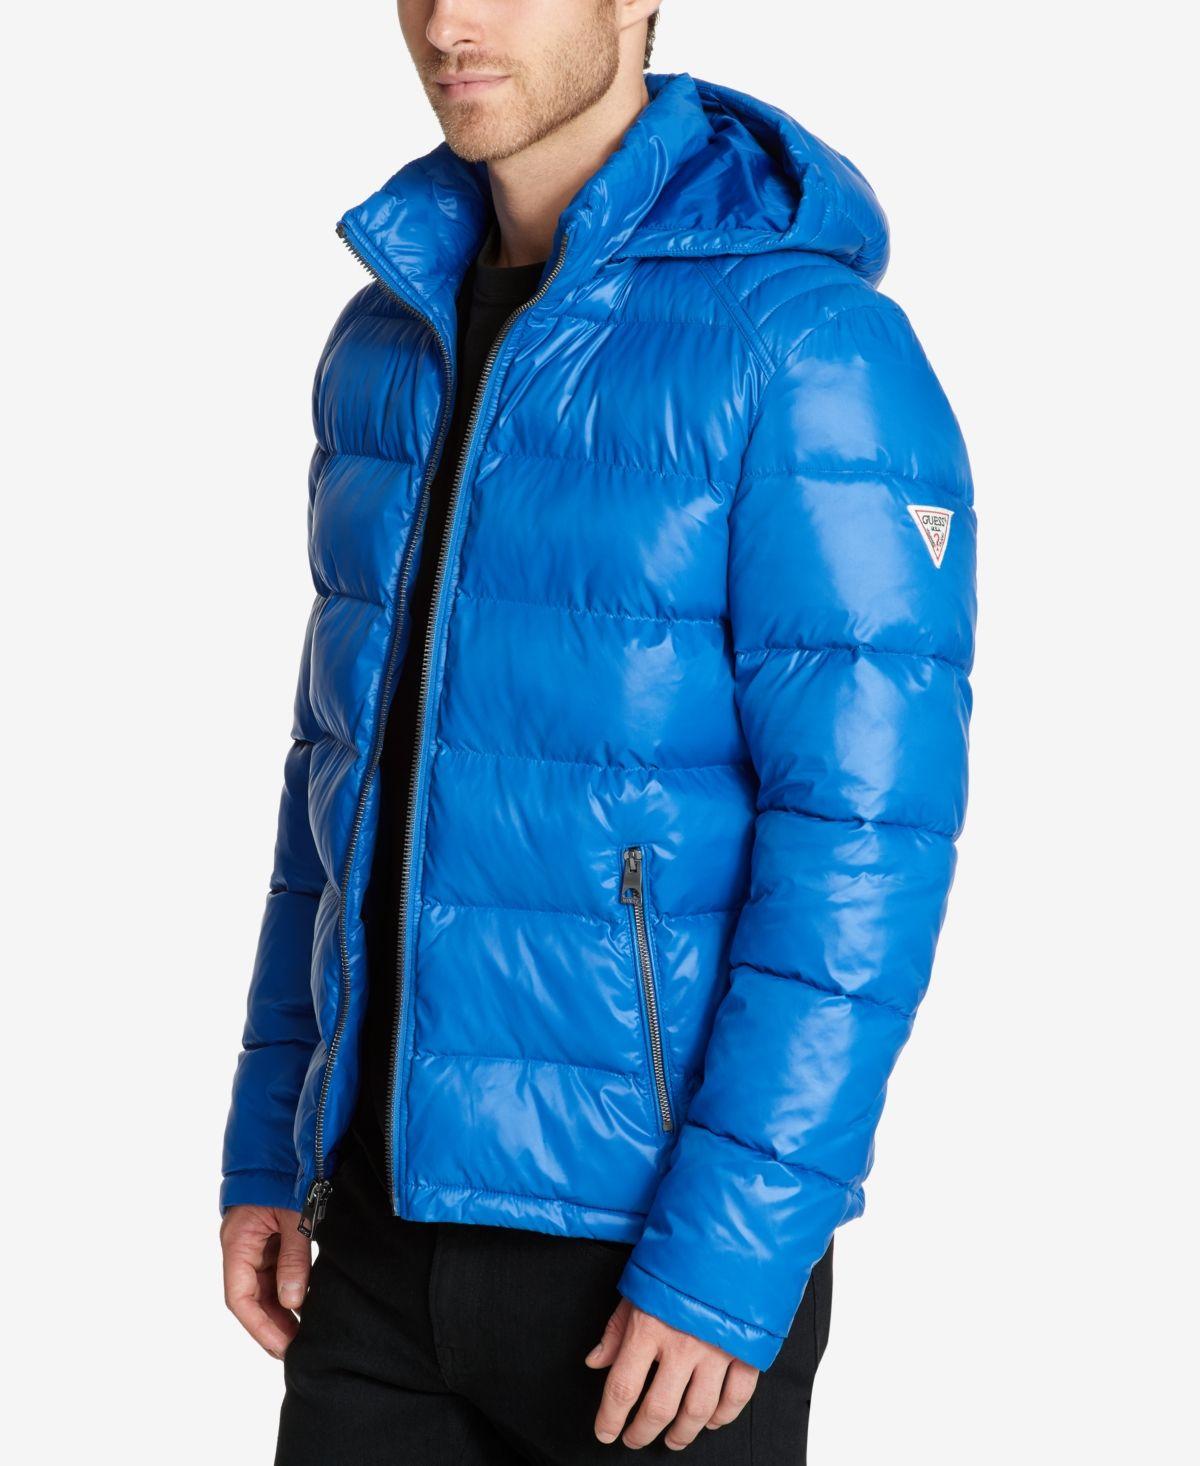 Guess Men S Hooded Puffer Coat Reviews Coats Jackets Men Macy S In 2021 Puffer Coat Guess Men Mens Hooded [ 1466 x 1200 Pixel ]